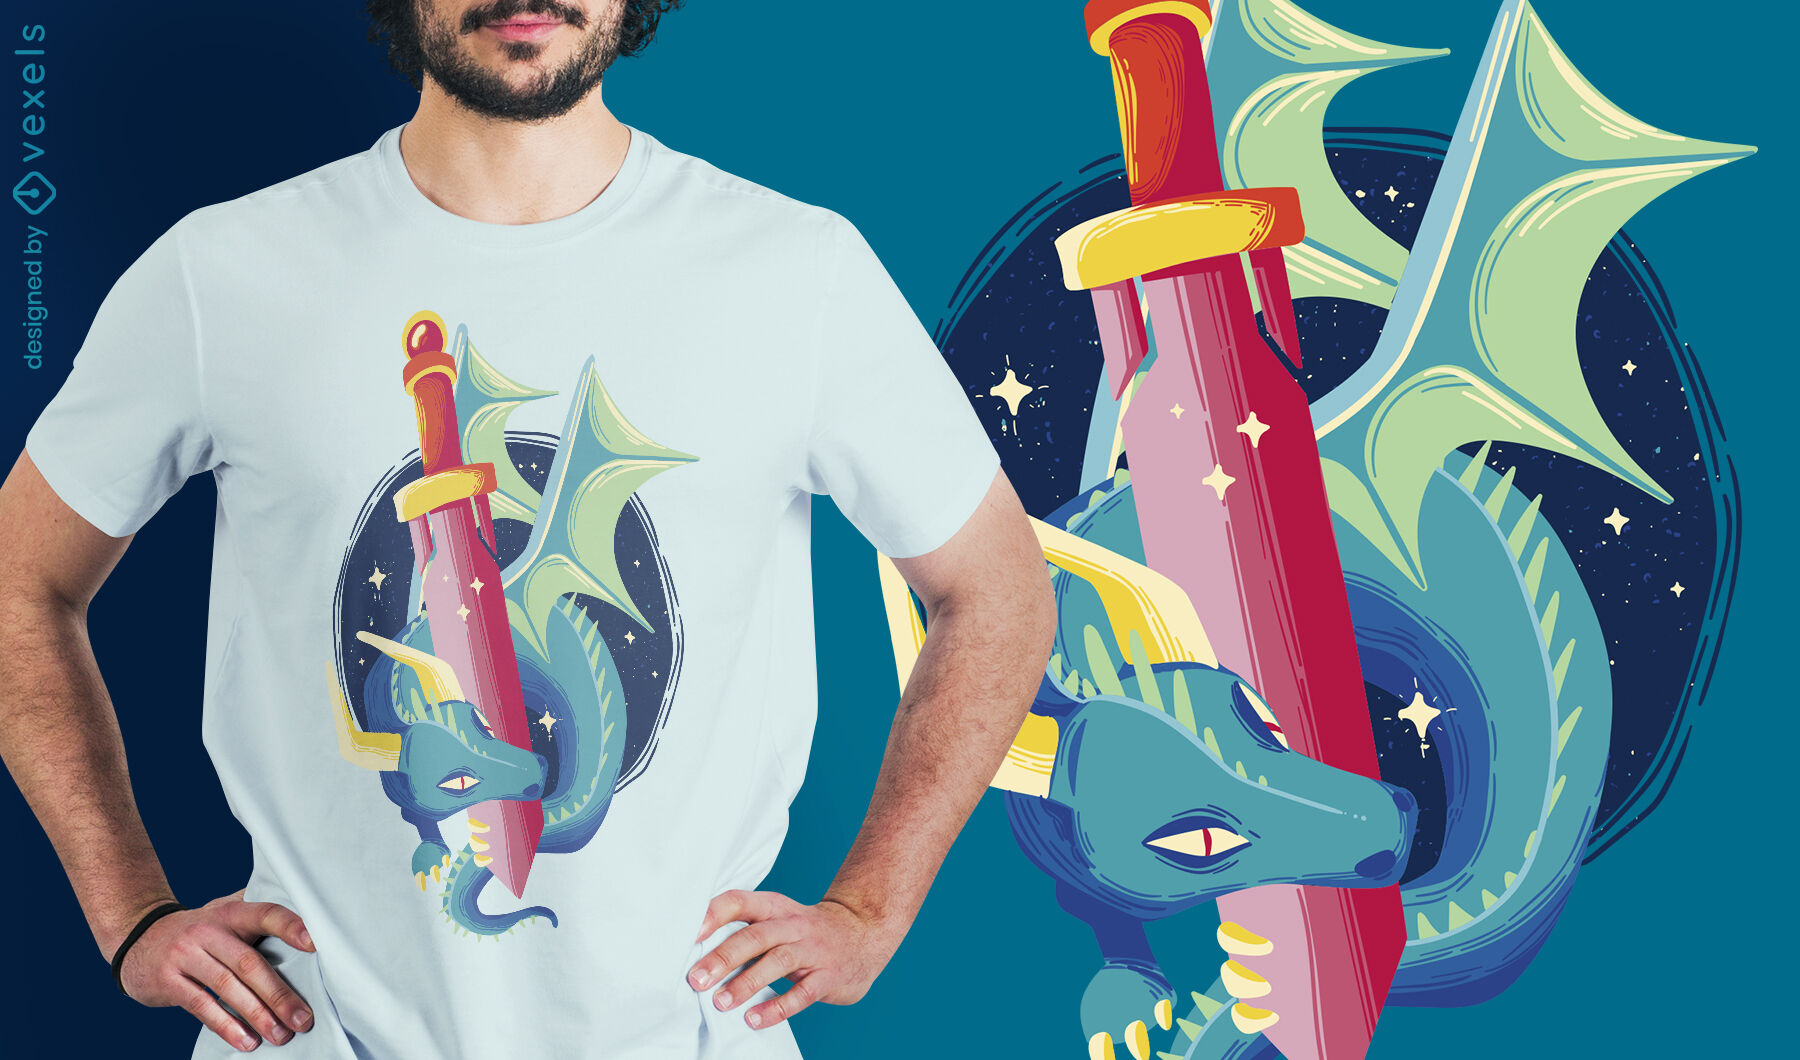 Fairytale dragon with sword t-shirt design